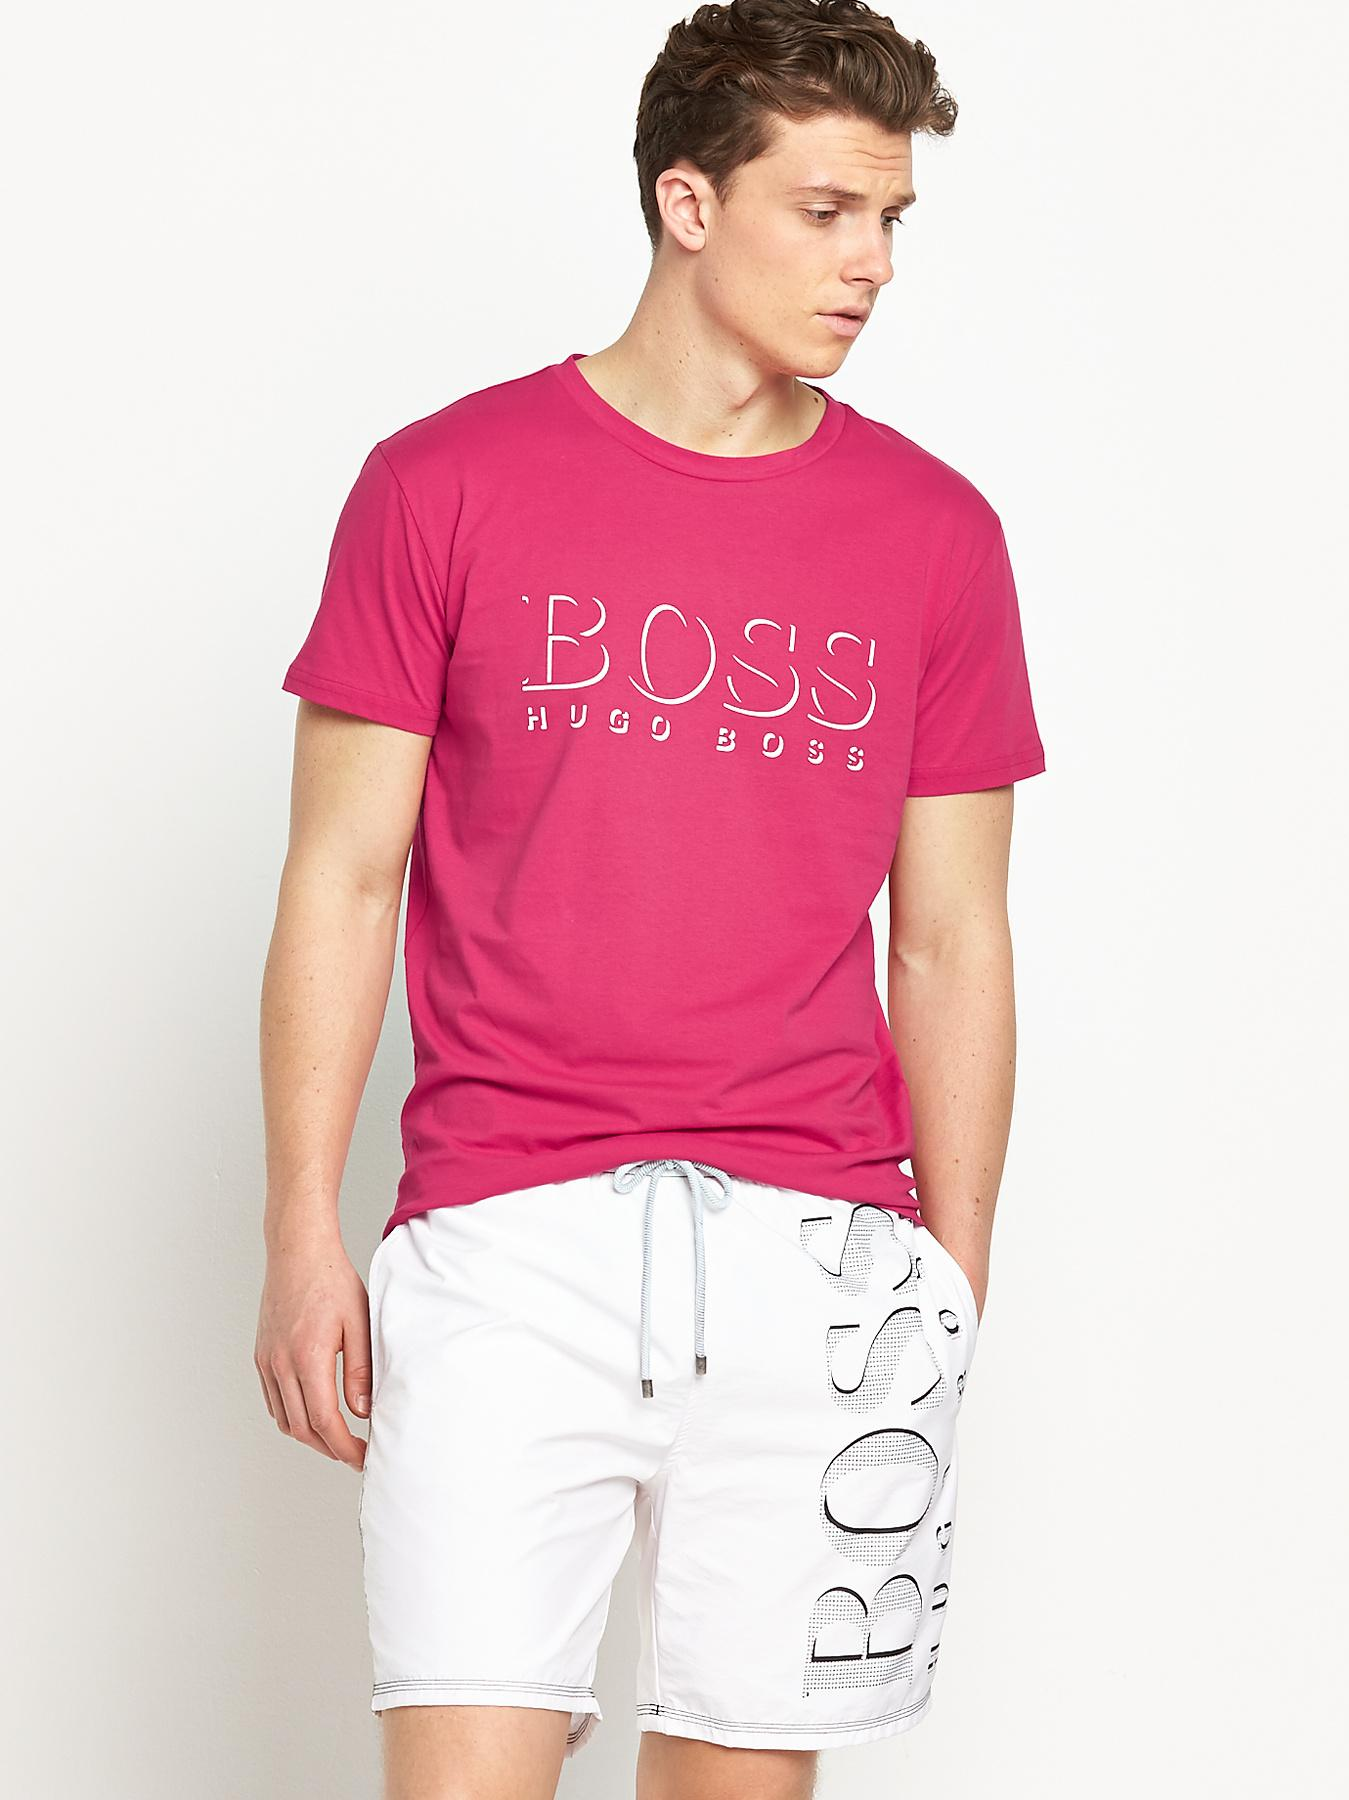 Hugo Boss Mens Short Sleeve T-shirt - Red - Red, Red